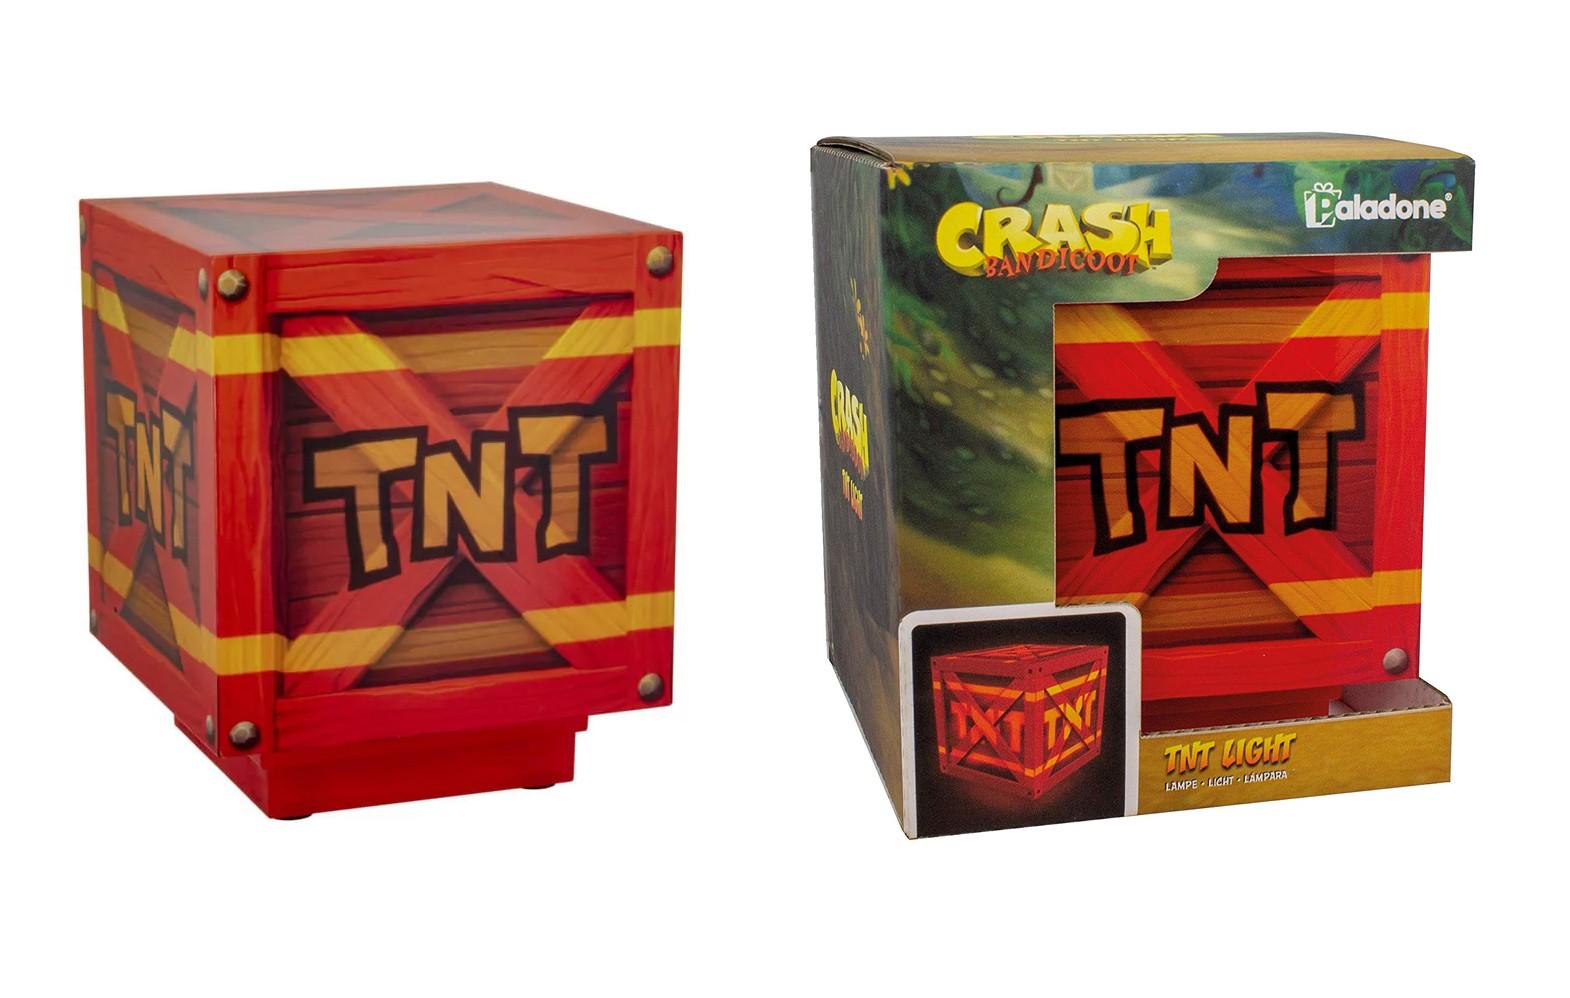 CRASH BANDICOOT - TNT Light 10cm